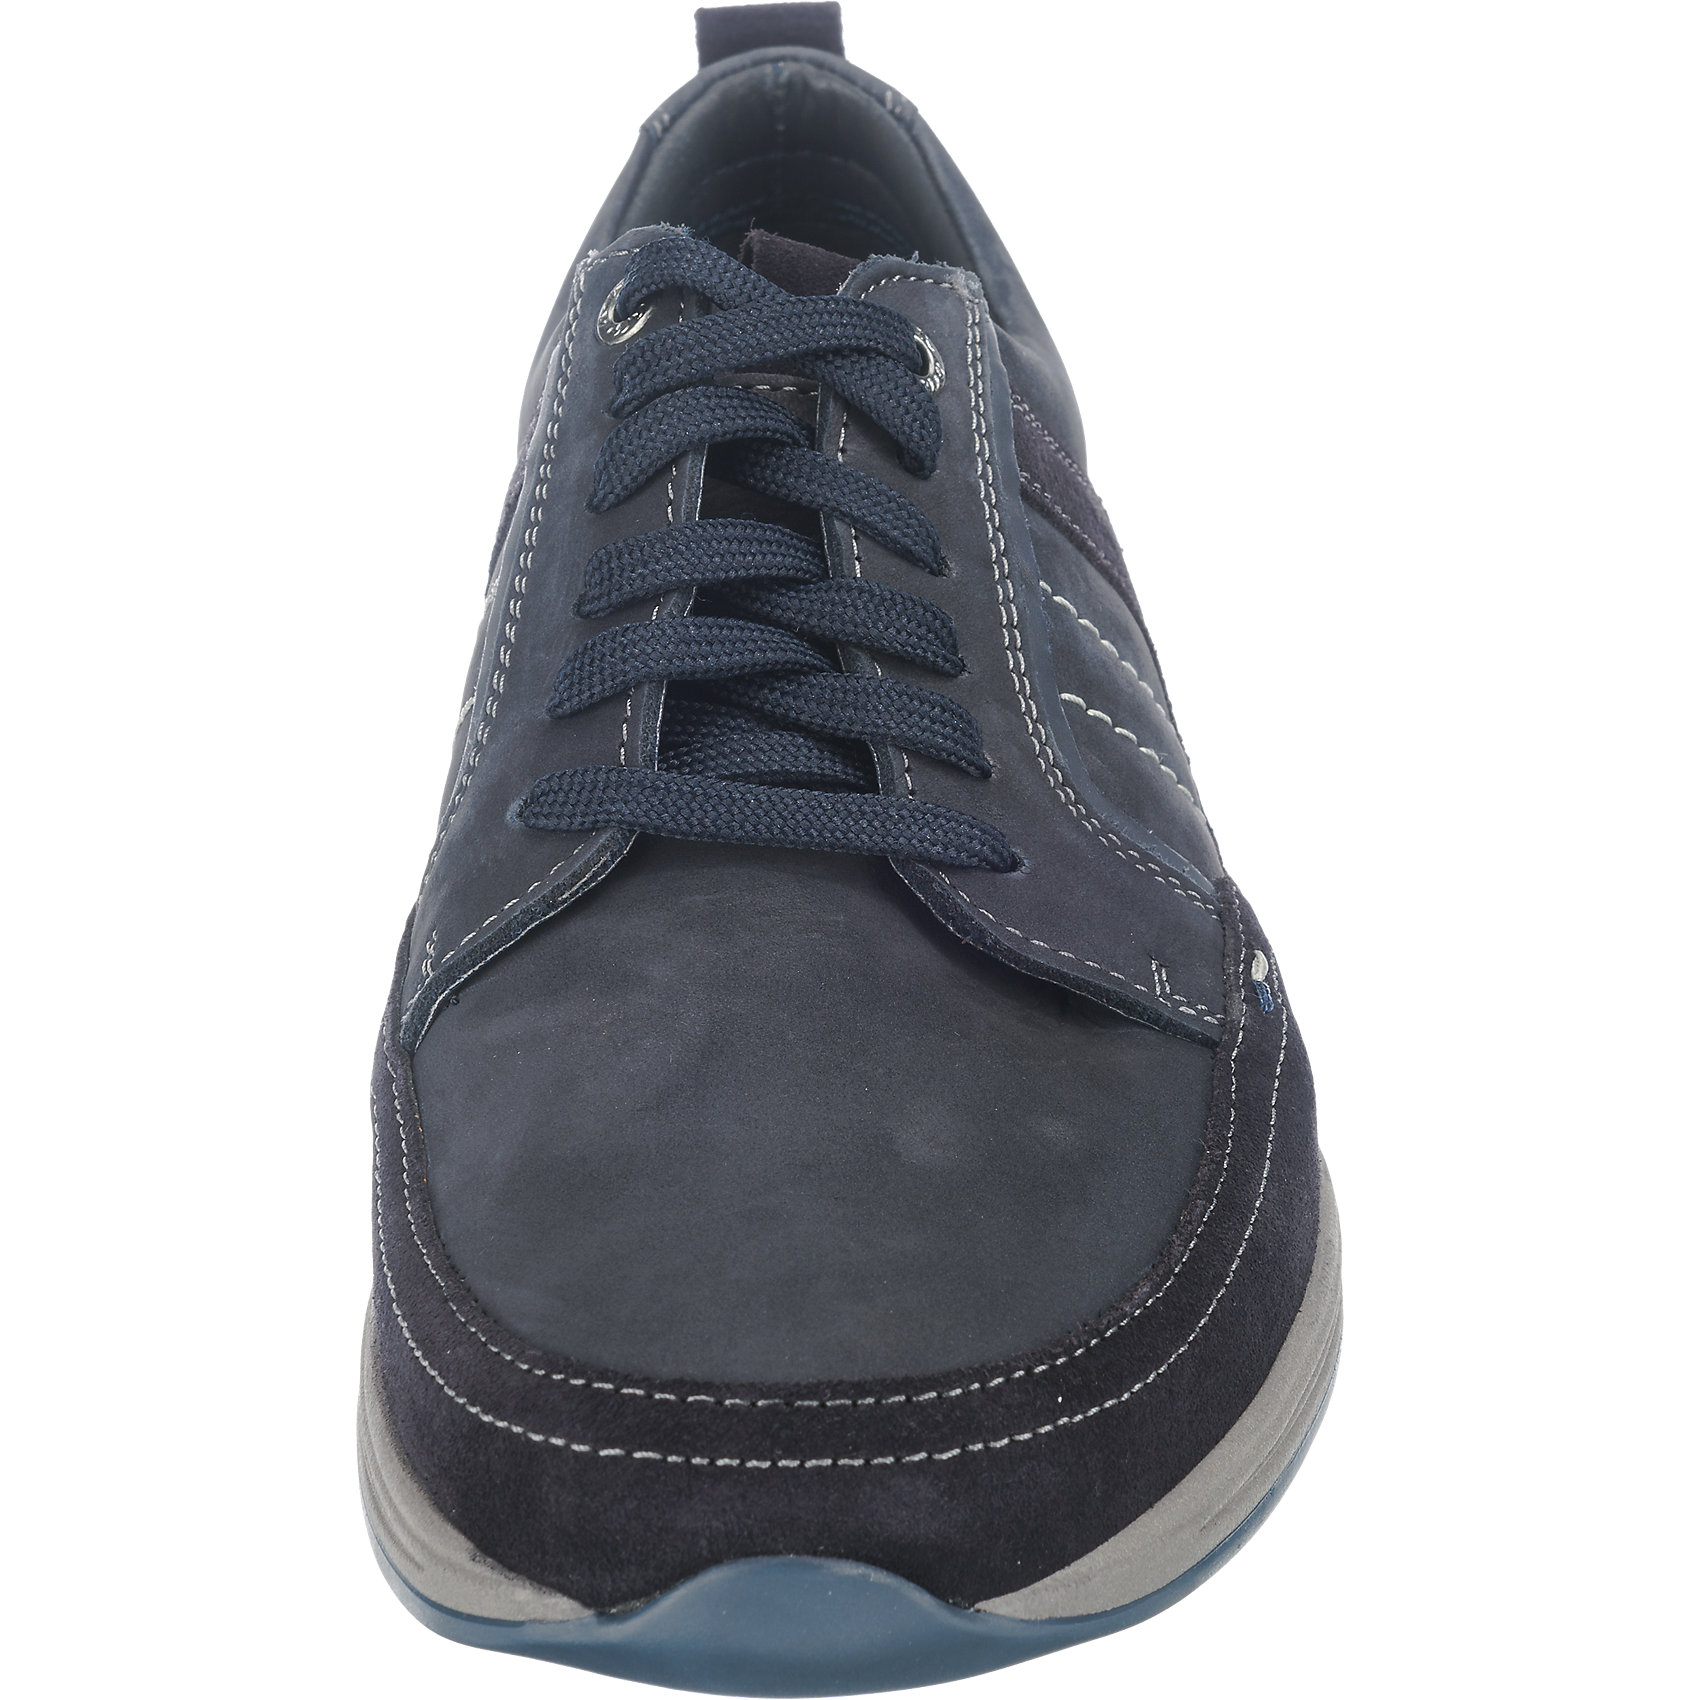 Neu ara Forest Freizeit Schuhe weit dunkelblau 5778041